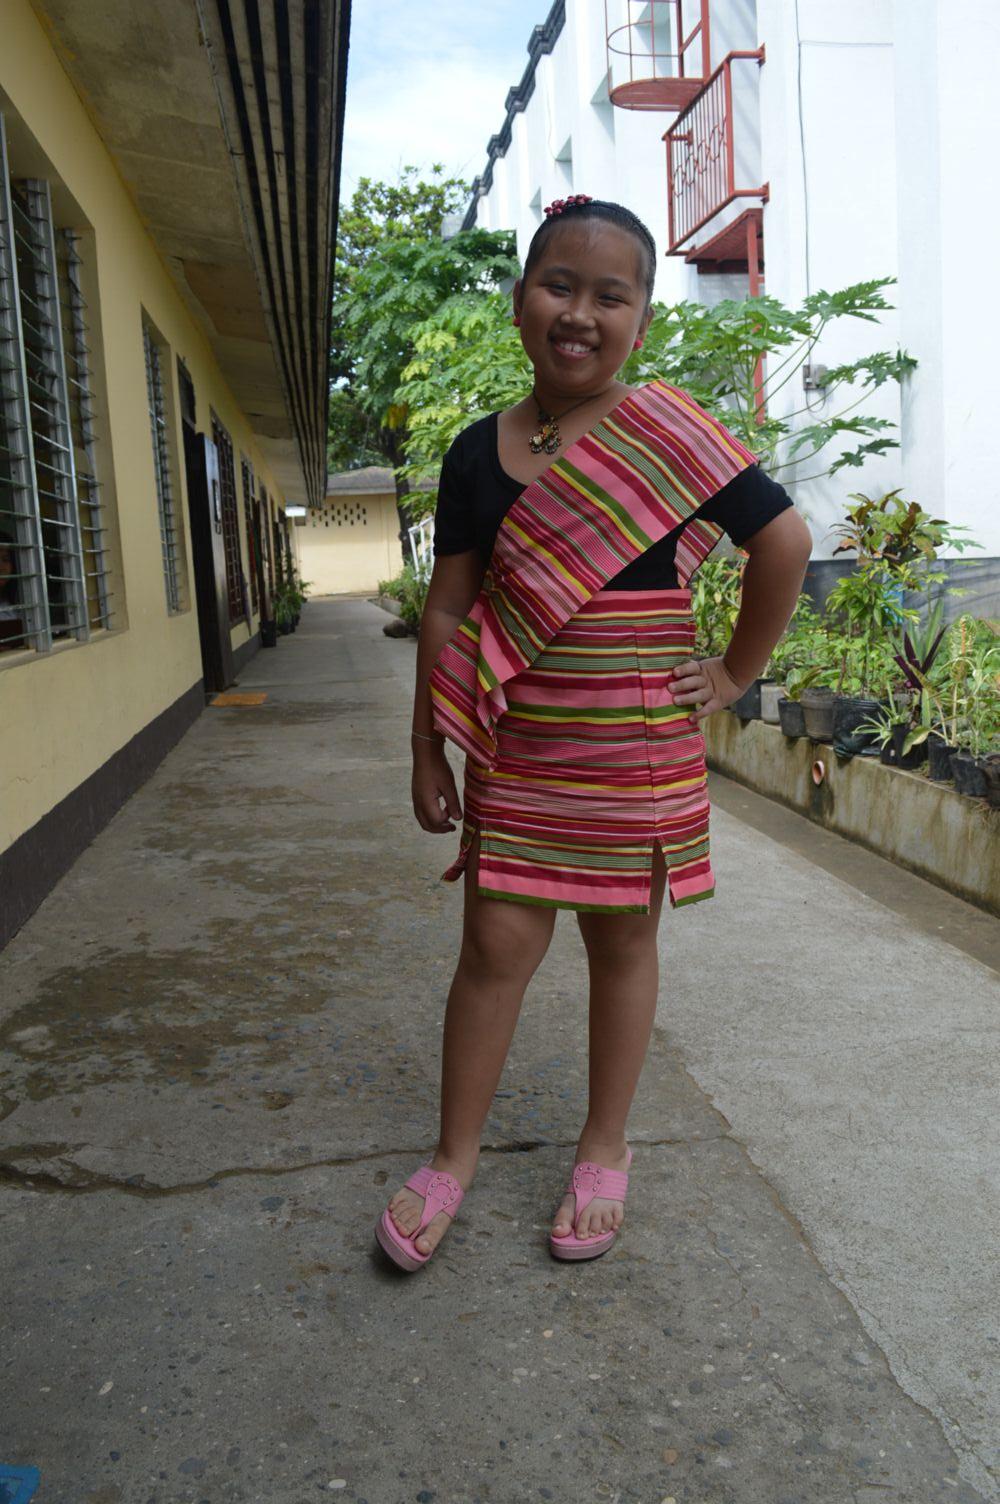 DSC_0051 DSC_0052 DSC_0061 DSC_0062 - Linggo Ng Wika Costume PNG